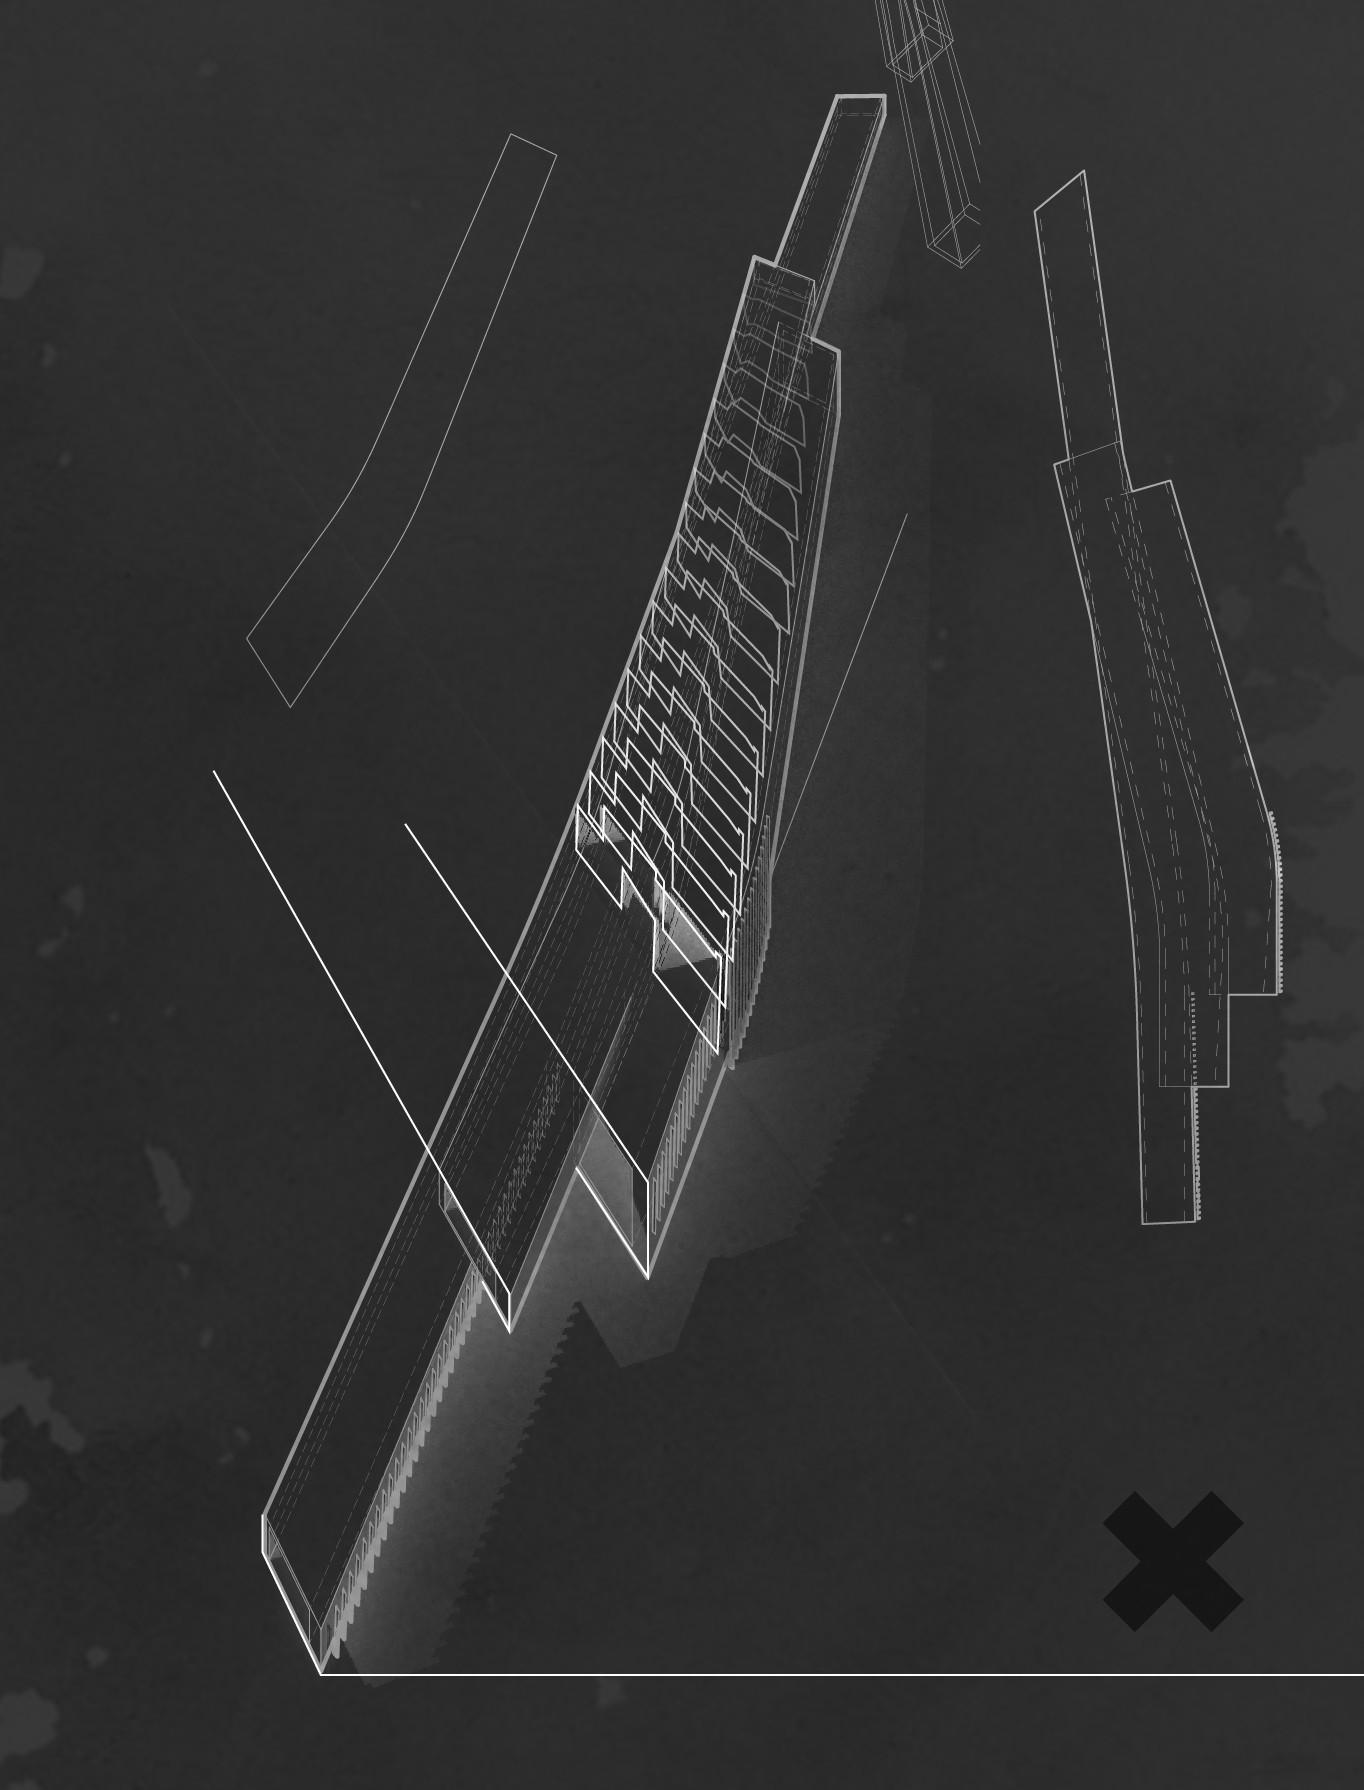 abc-01.jpg